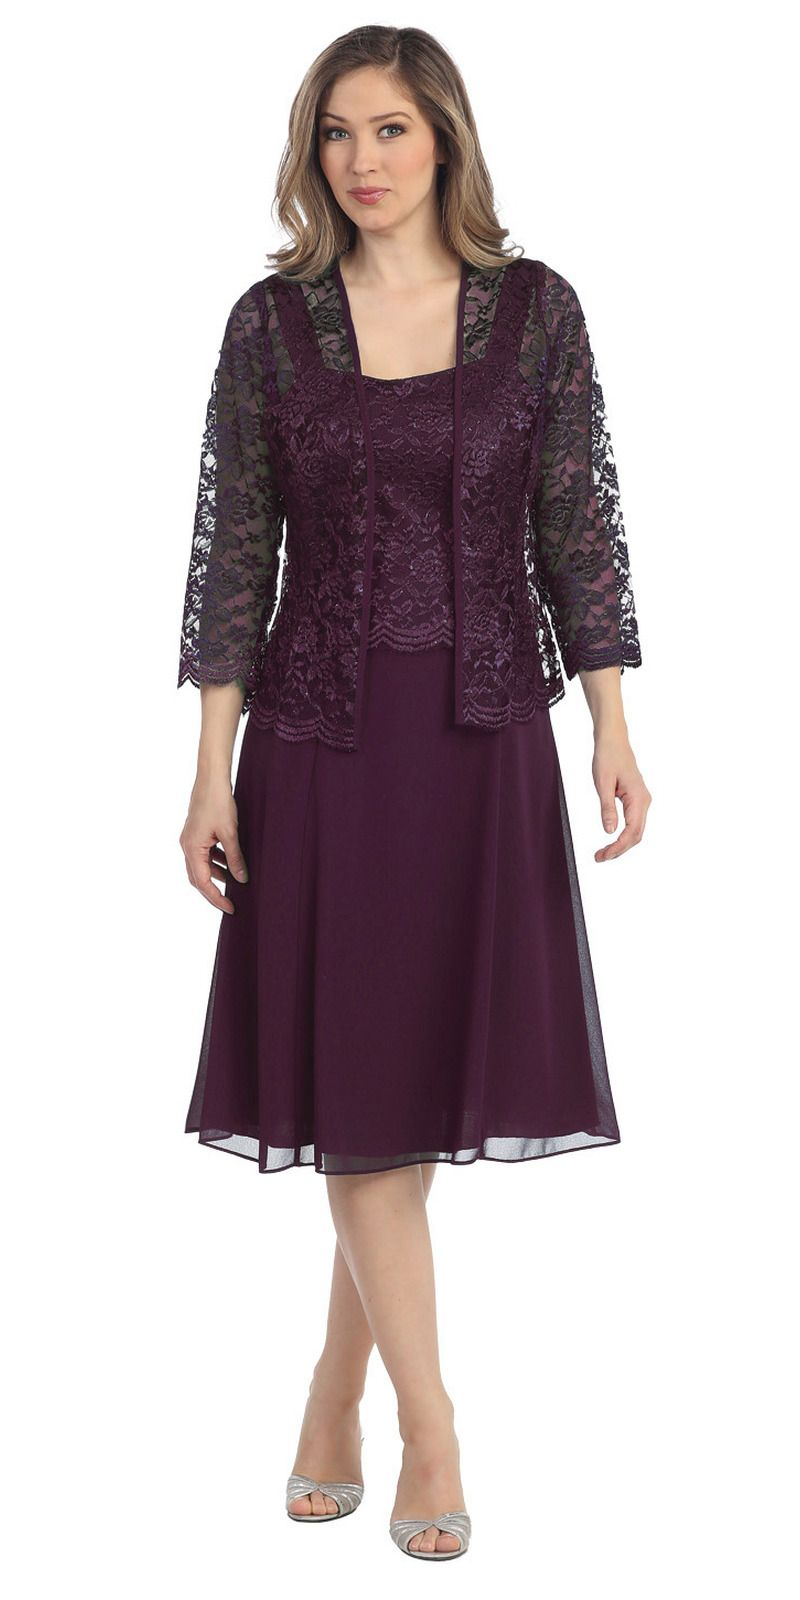 Lace dress jacket  Short Plum Mother of Groom Dress Chiffon Knee Length Lace Jacket